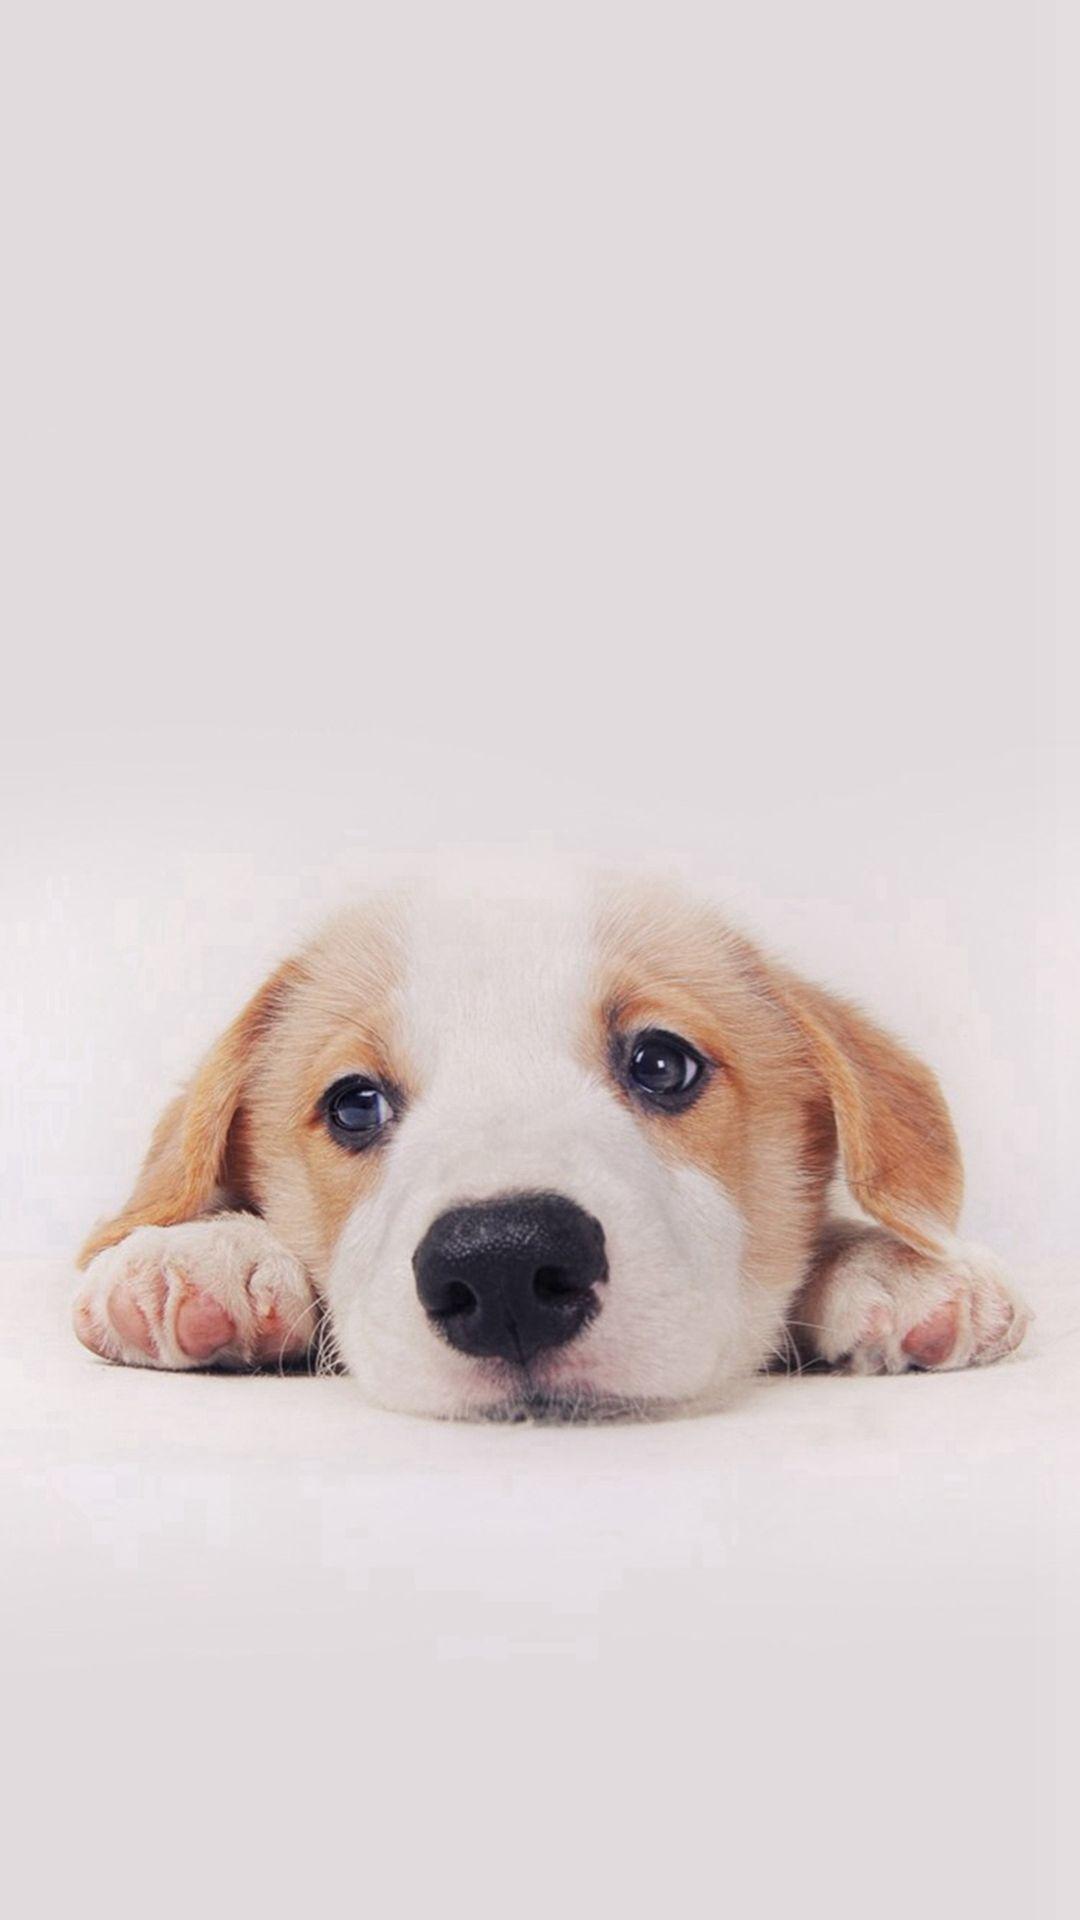 Cute Puppy Dog Pet #iPhone #6 #plus #wallpaper | iPhone 6~8 Wallpapers | Cute puppy wallpaper ...